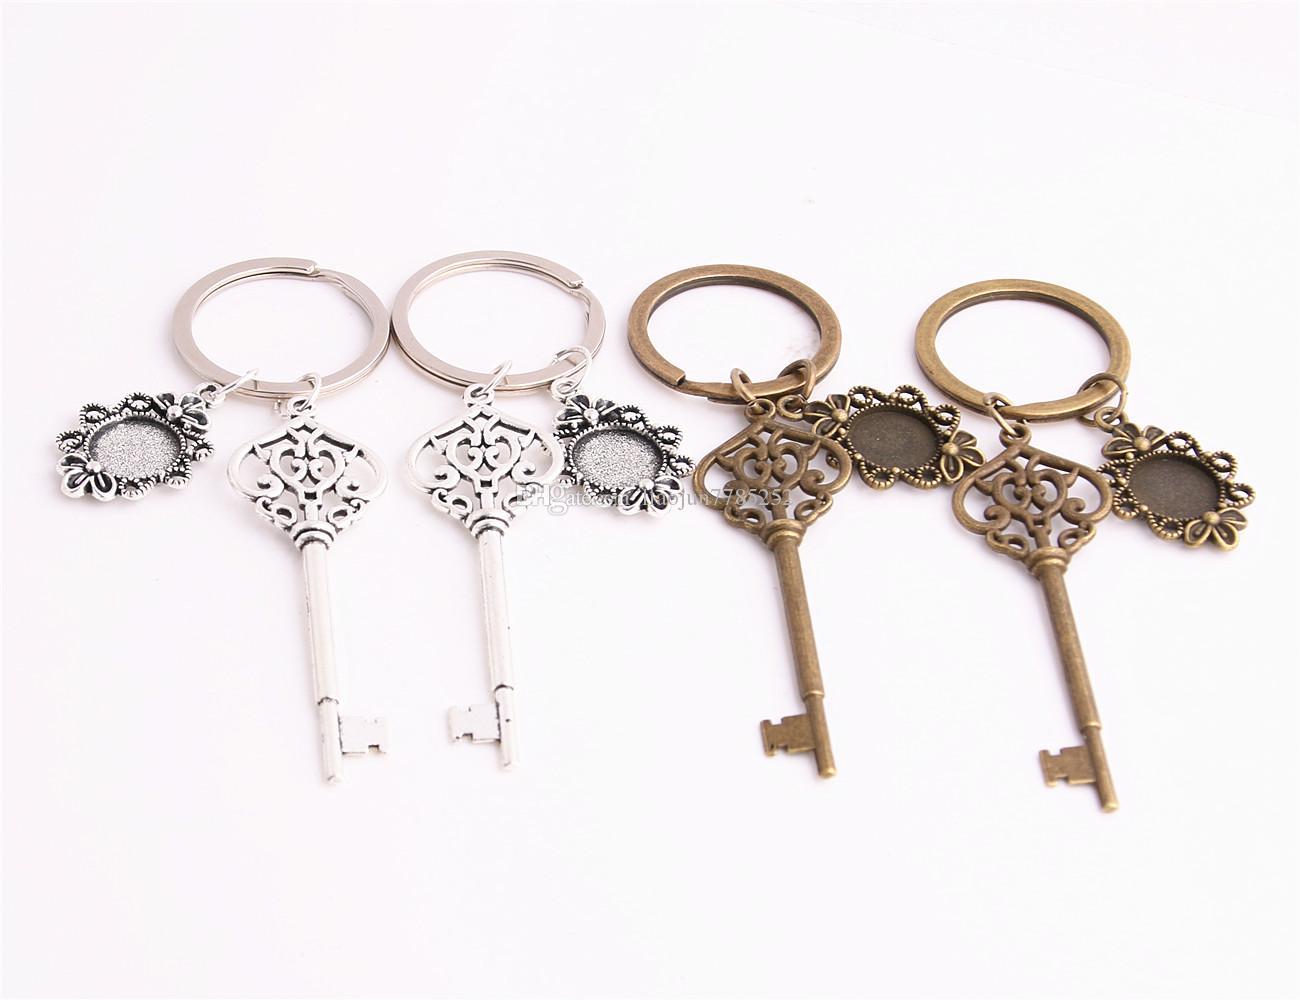 SWEET BELL 3pcs/lot Metal Alloy Zinc Key Chain Fit Round 12.5mm Cabochon Base Key Charm Pendant Diy Jewelry Making C0894